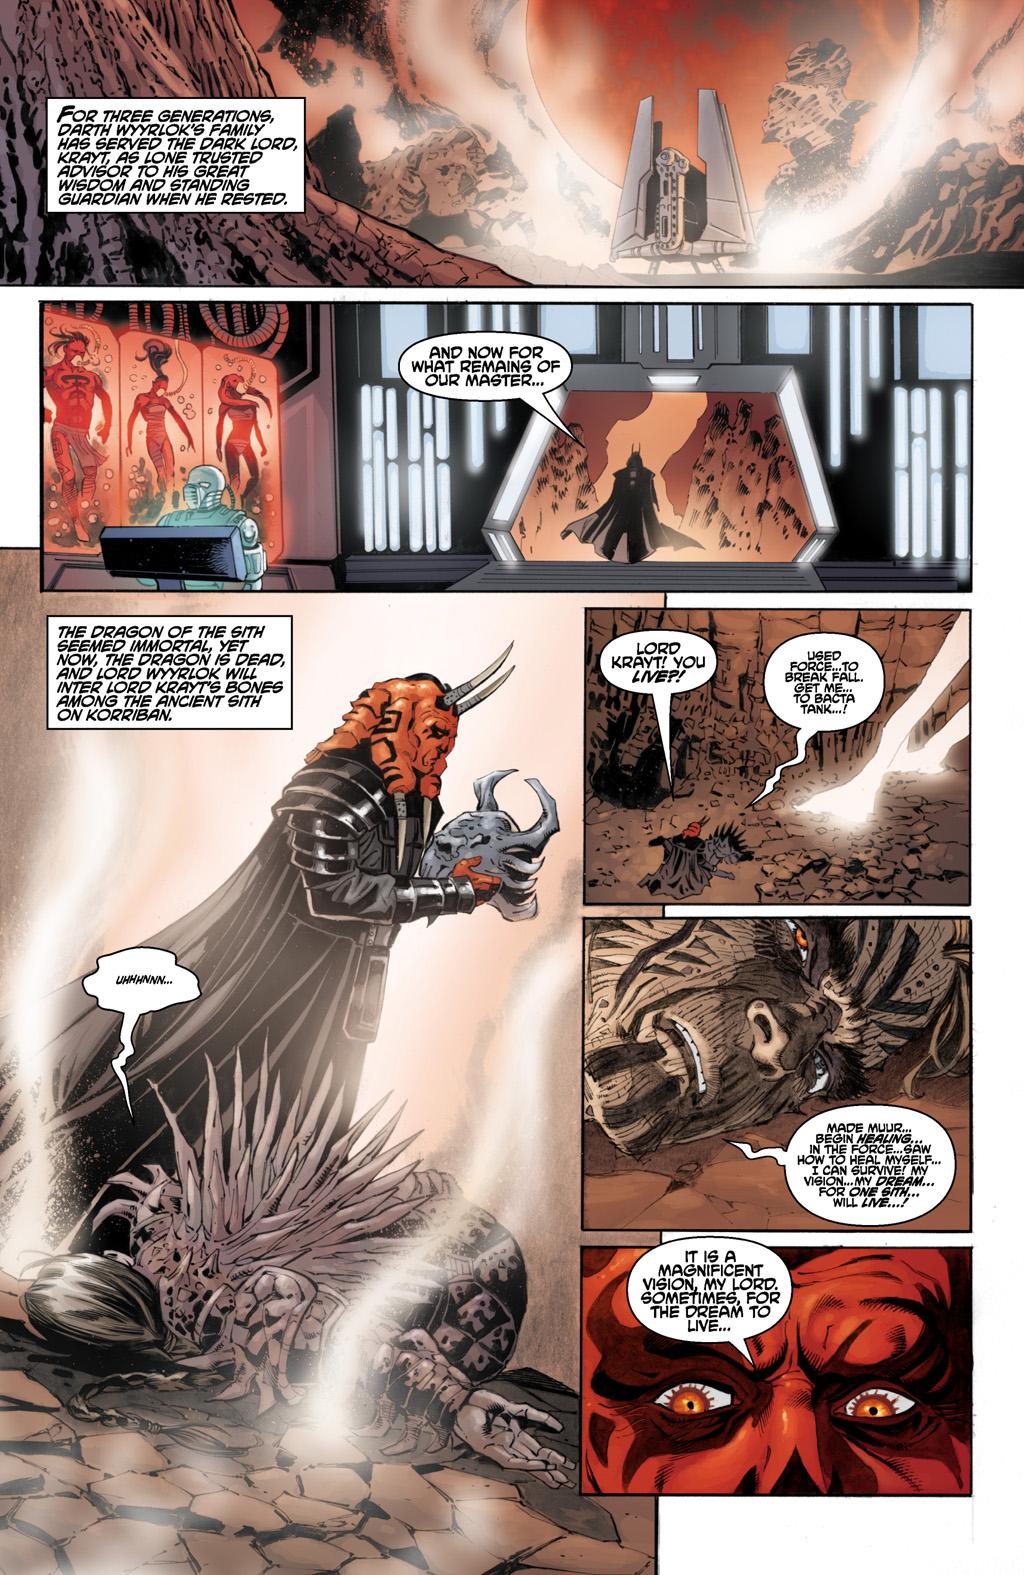 SS - Ajunta Pall (Cheth) vs Cade Skywalker (ArkhamAsylum3) Krayt_24